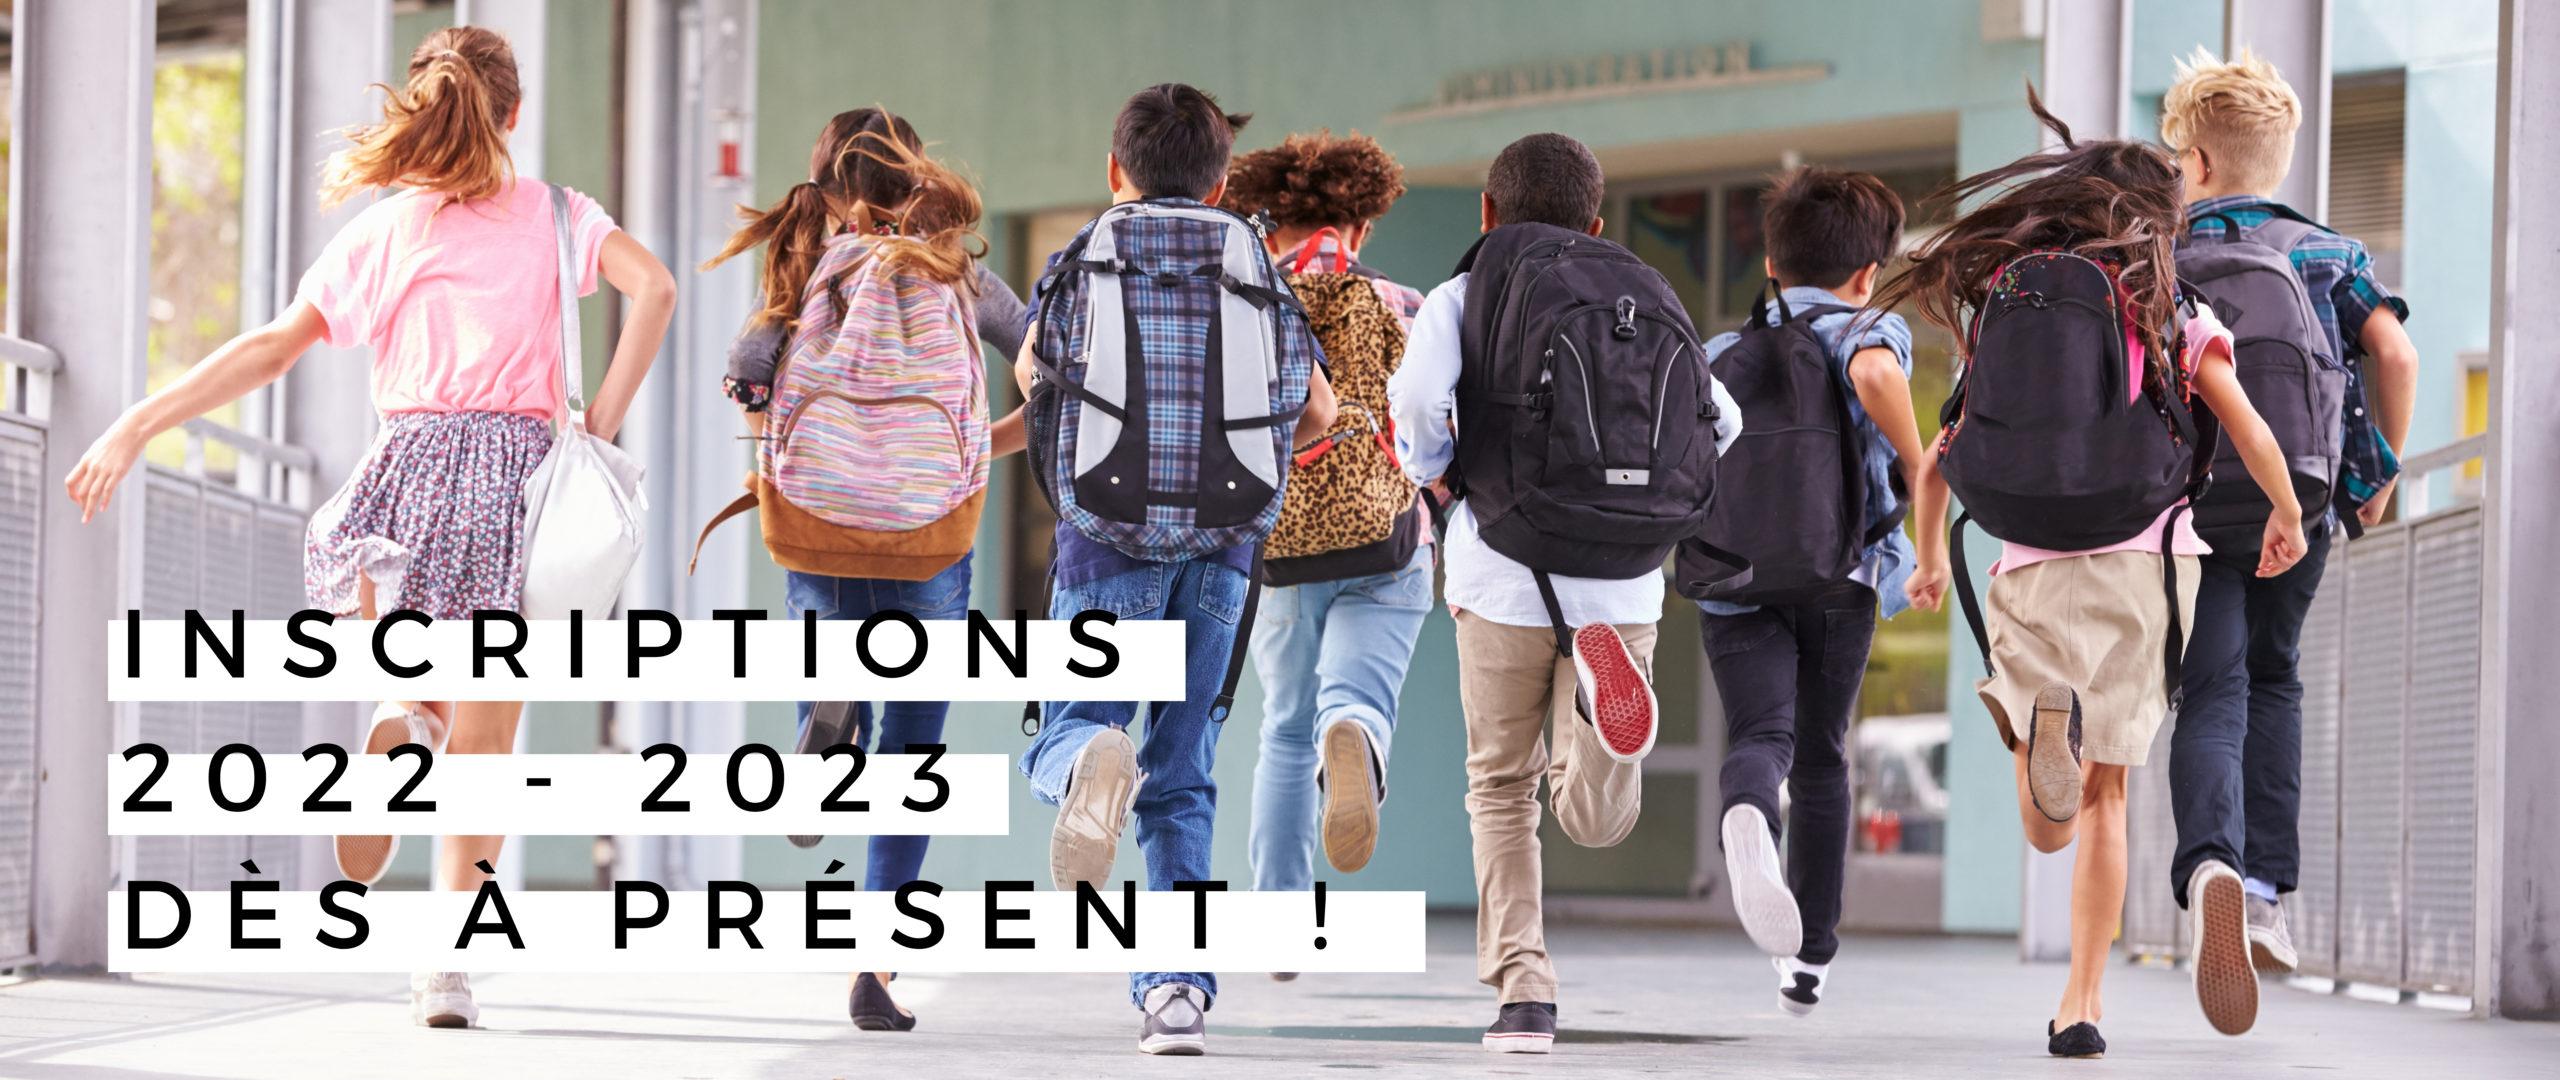 INSCRIPTIONS 2022-2023